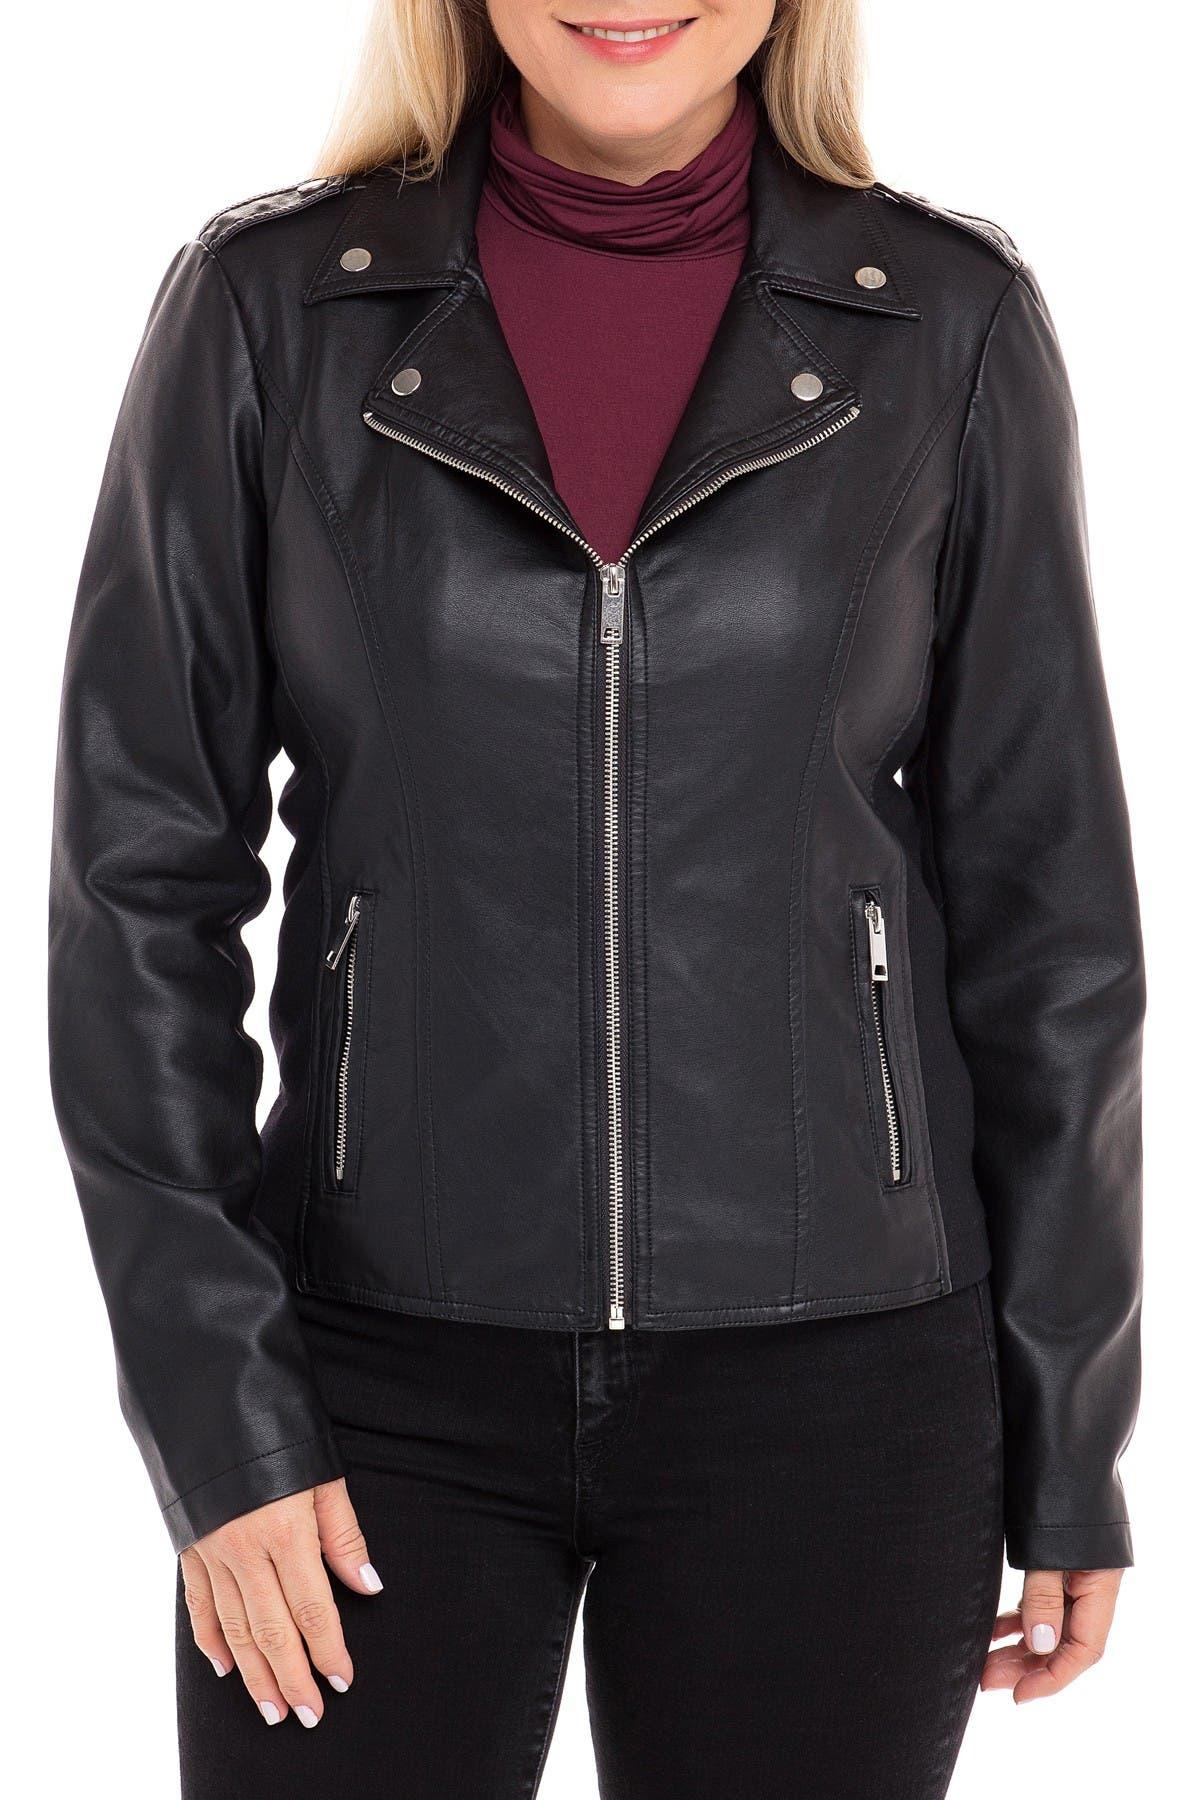 Image of Sebby Center Zip Faux Leather Moto Jacket